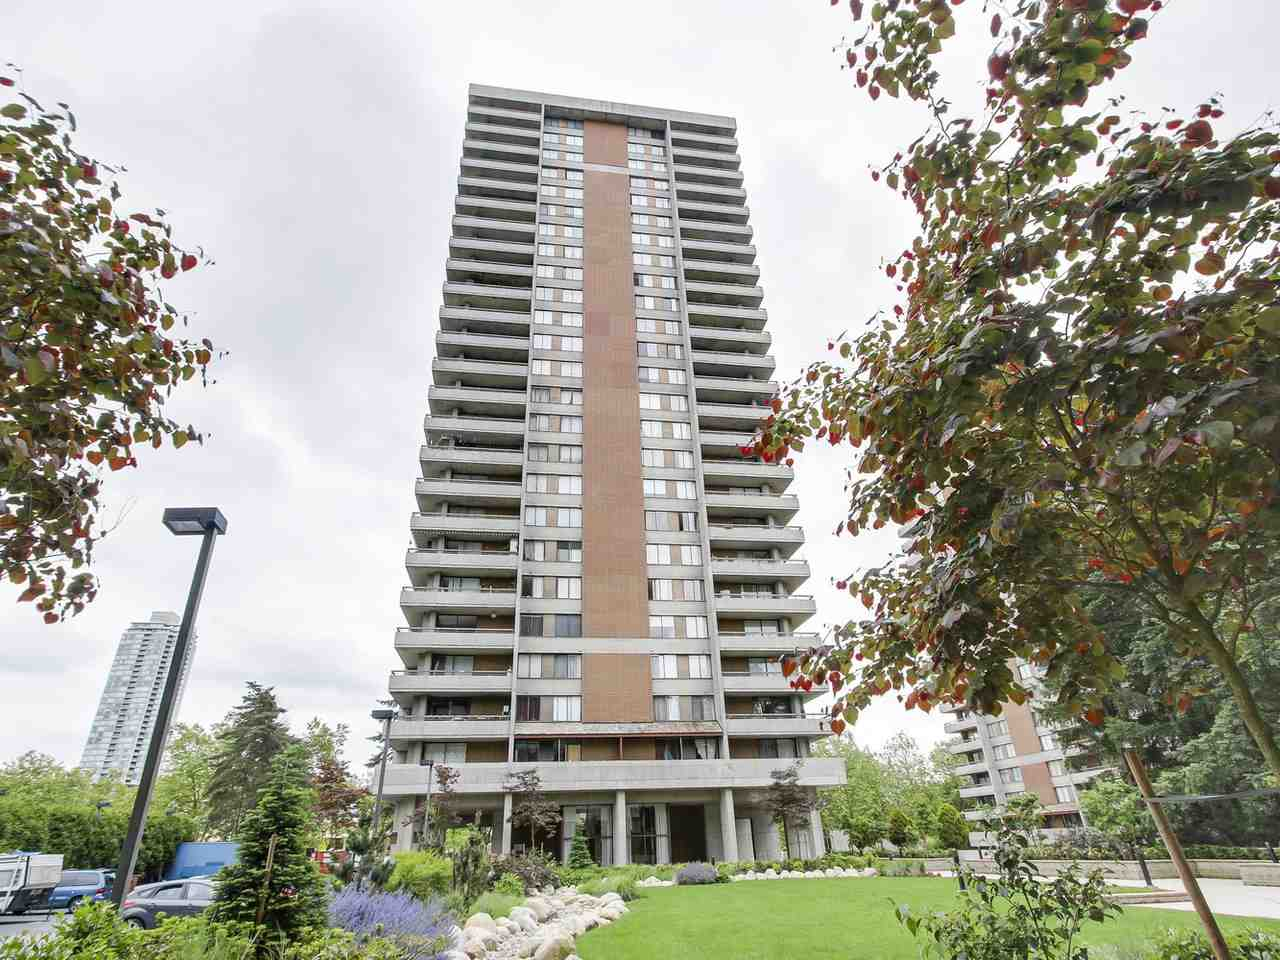 Condo Apartment at 905 3755 BARTLETT COURT, Unit 905, Burnaby North, British Columbia. Image 1